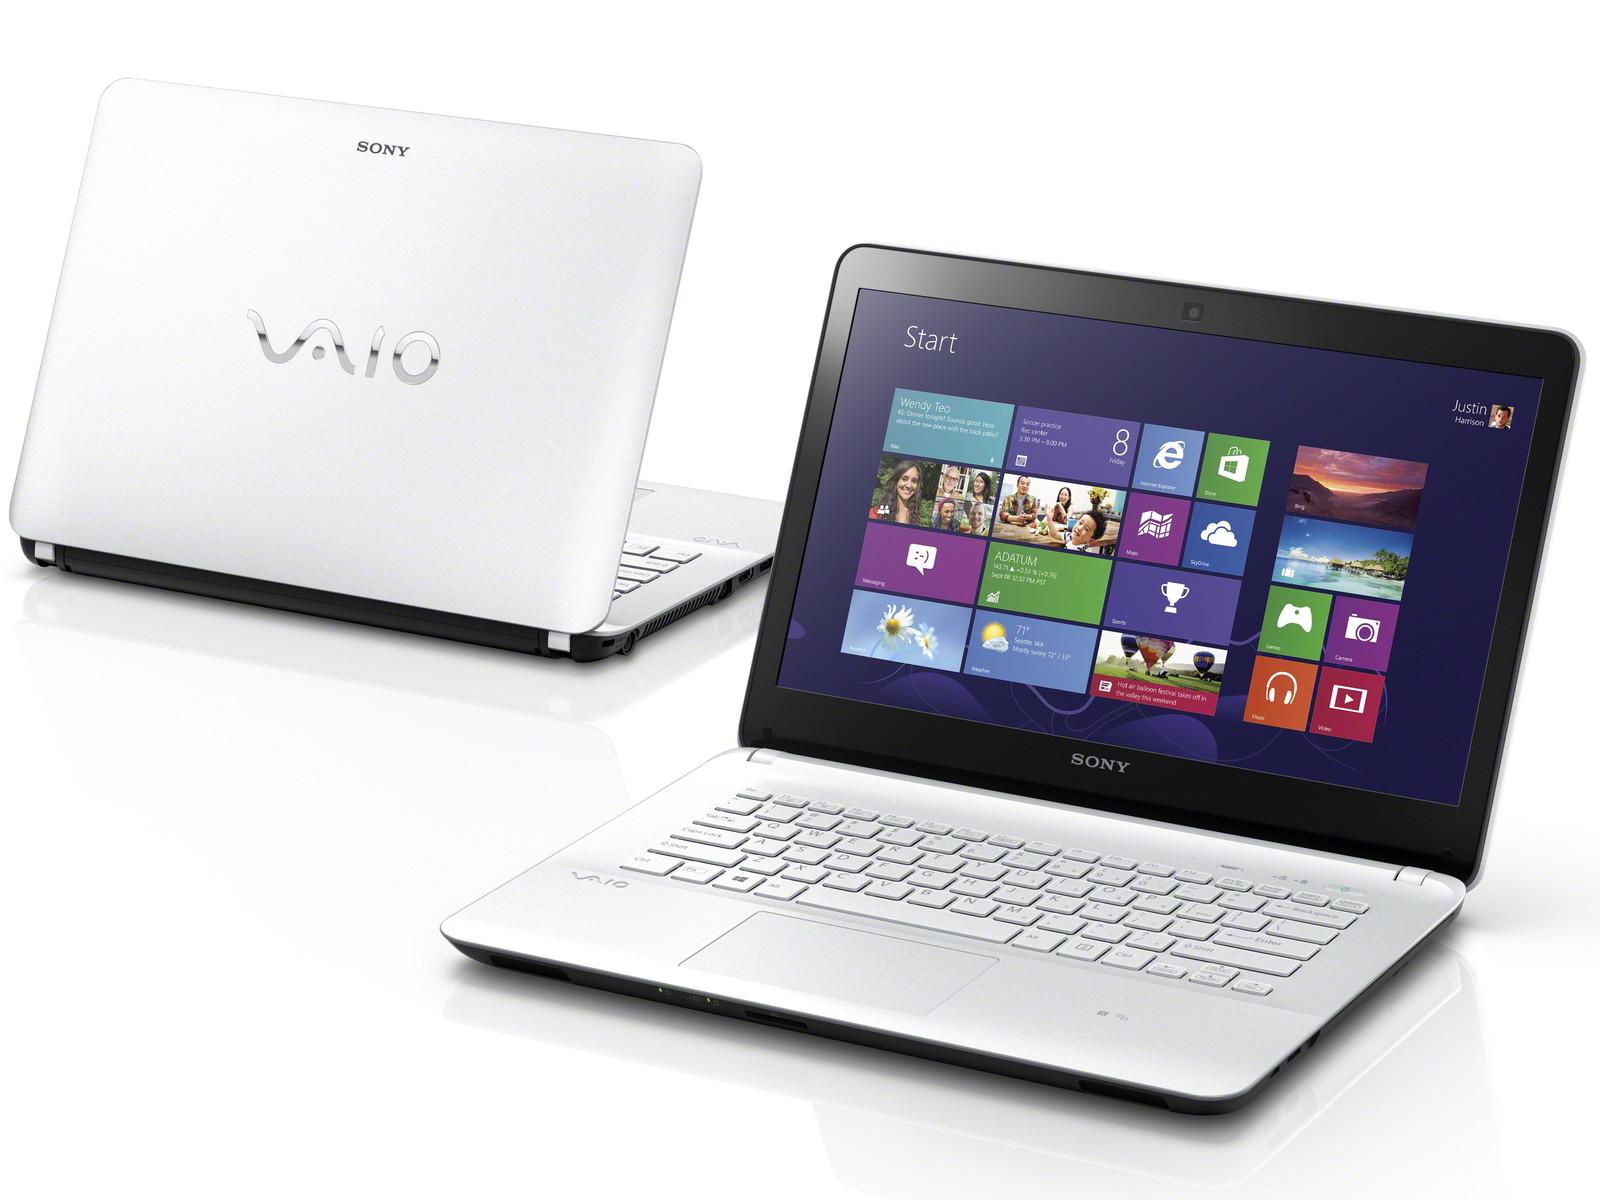 Sony Vaio Fit SVF-15217SG/W-i3-3227U-4GB-500GB-GT 740M / Intel HD 4000